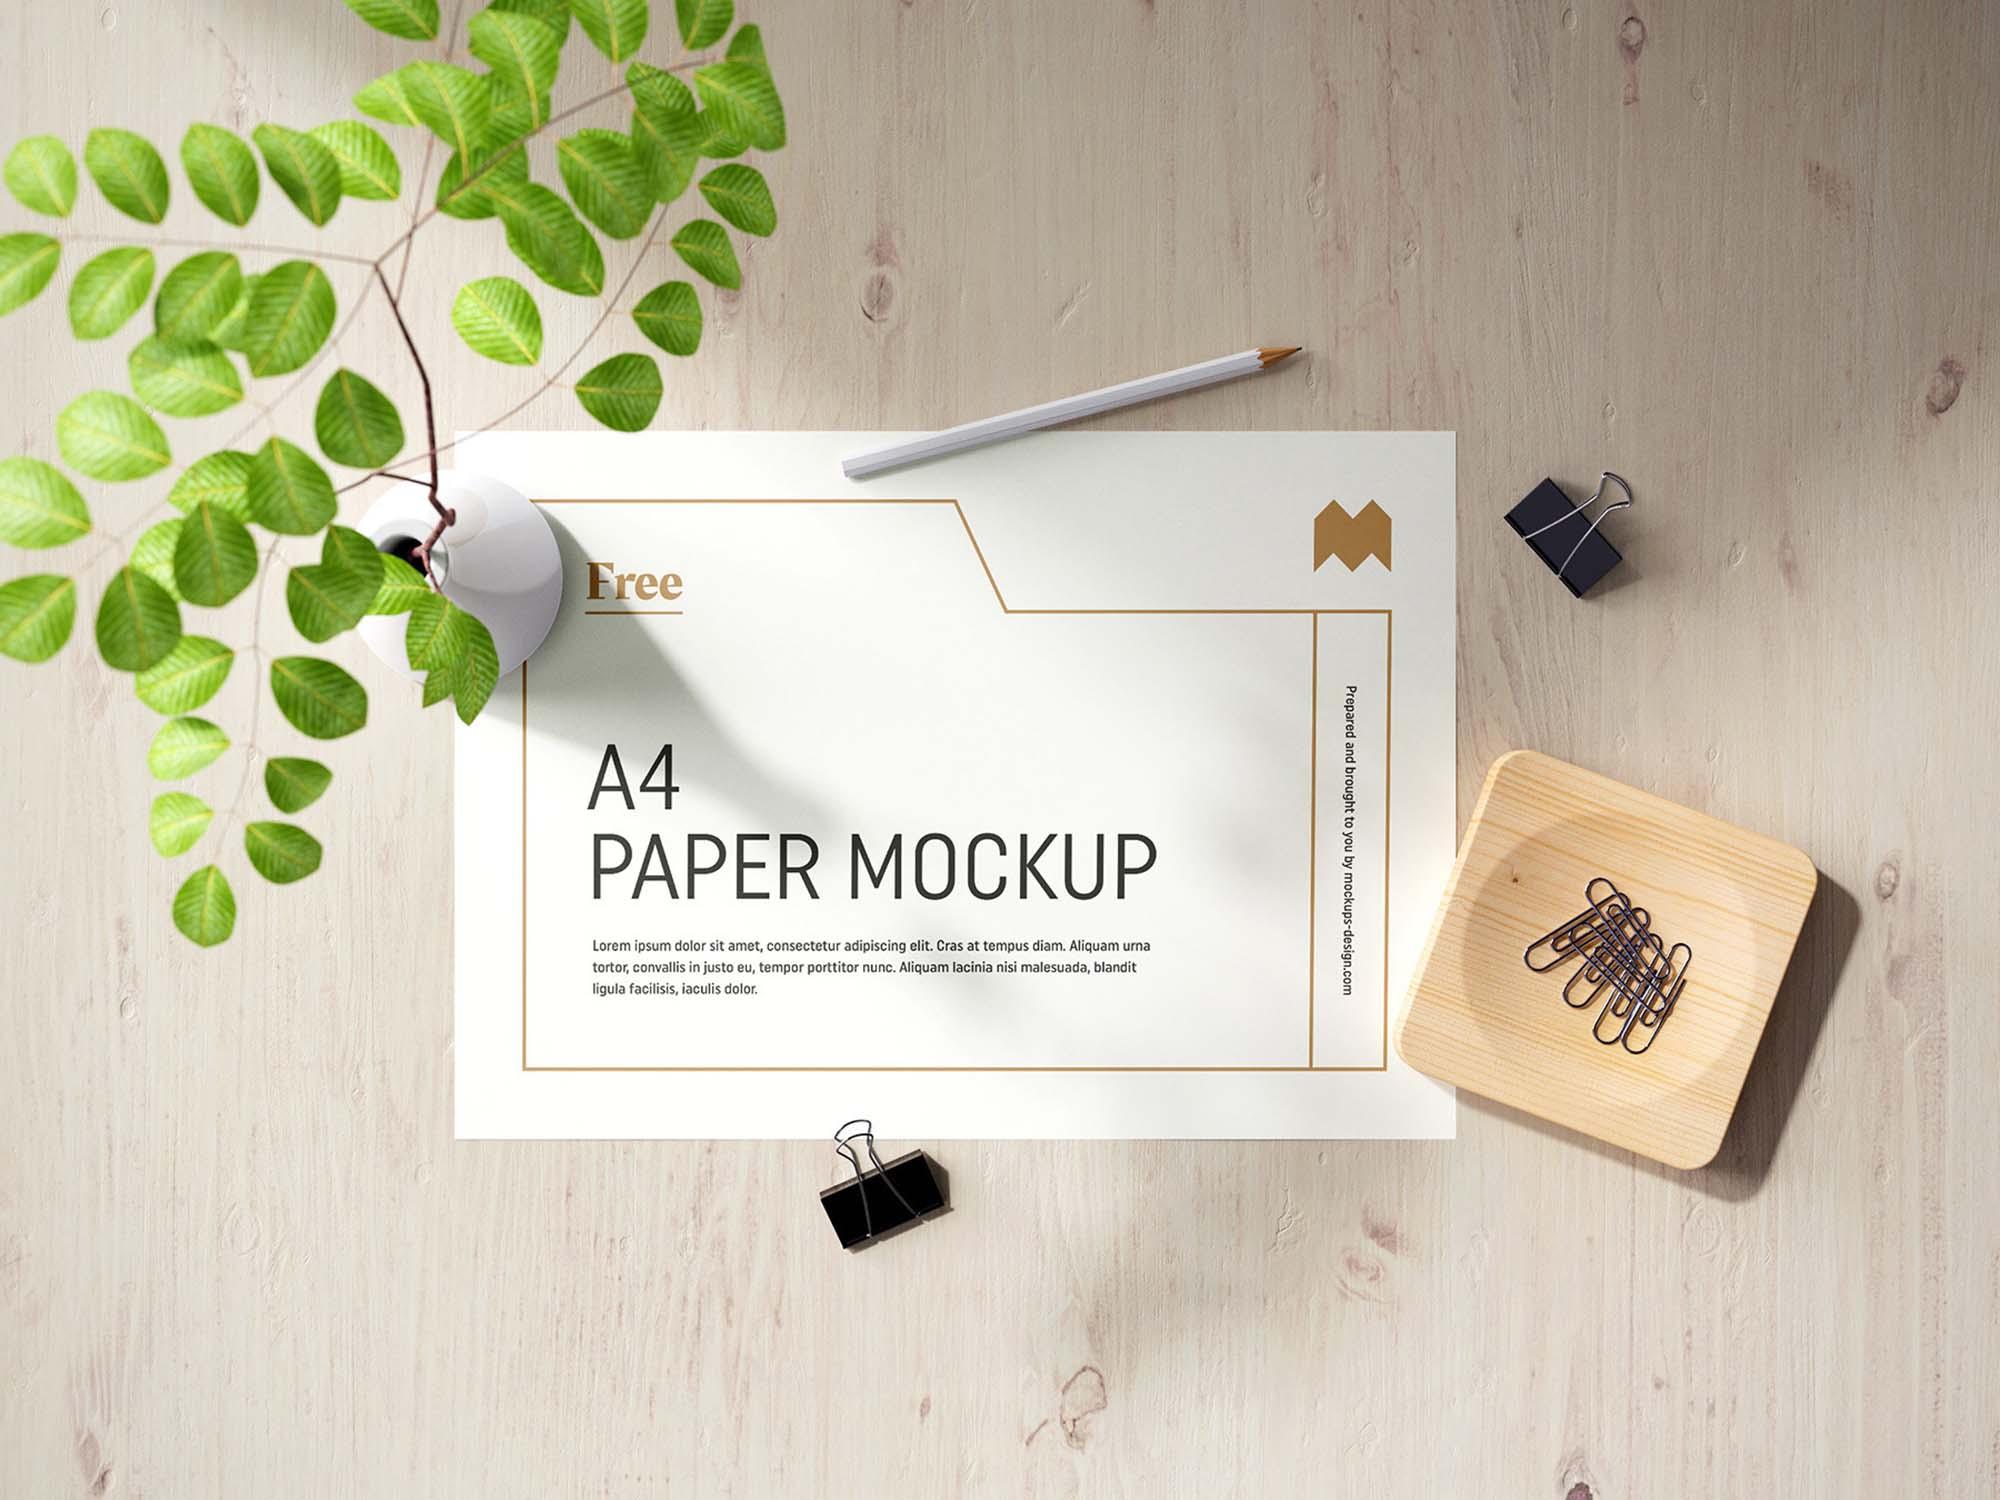 A4 Paper Mockup 3